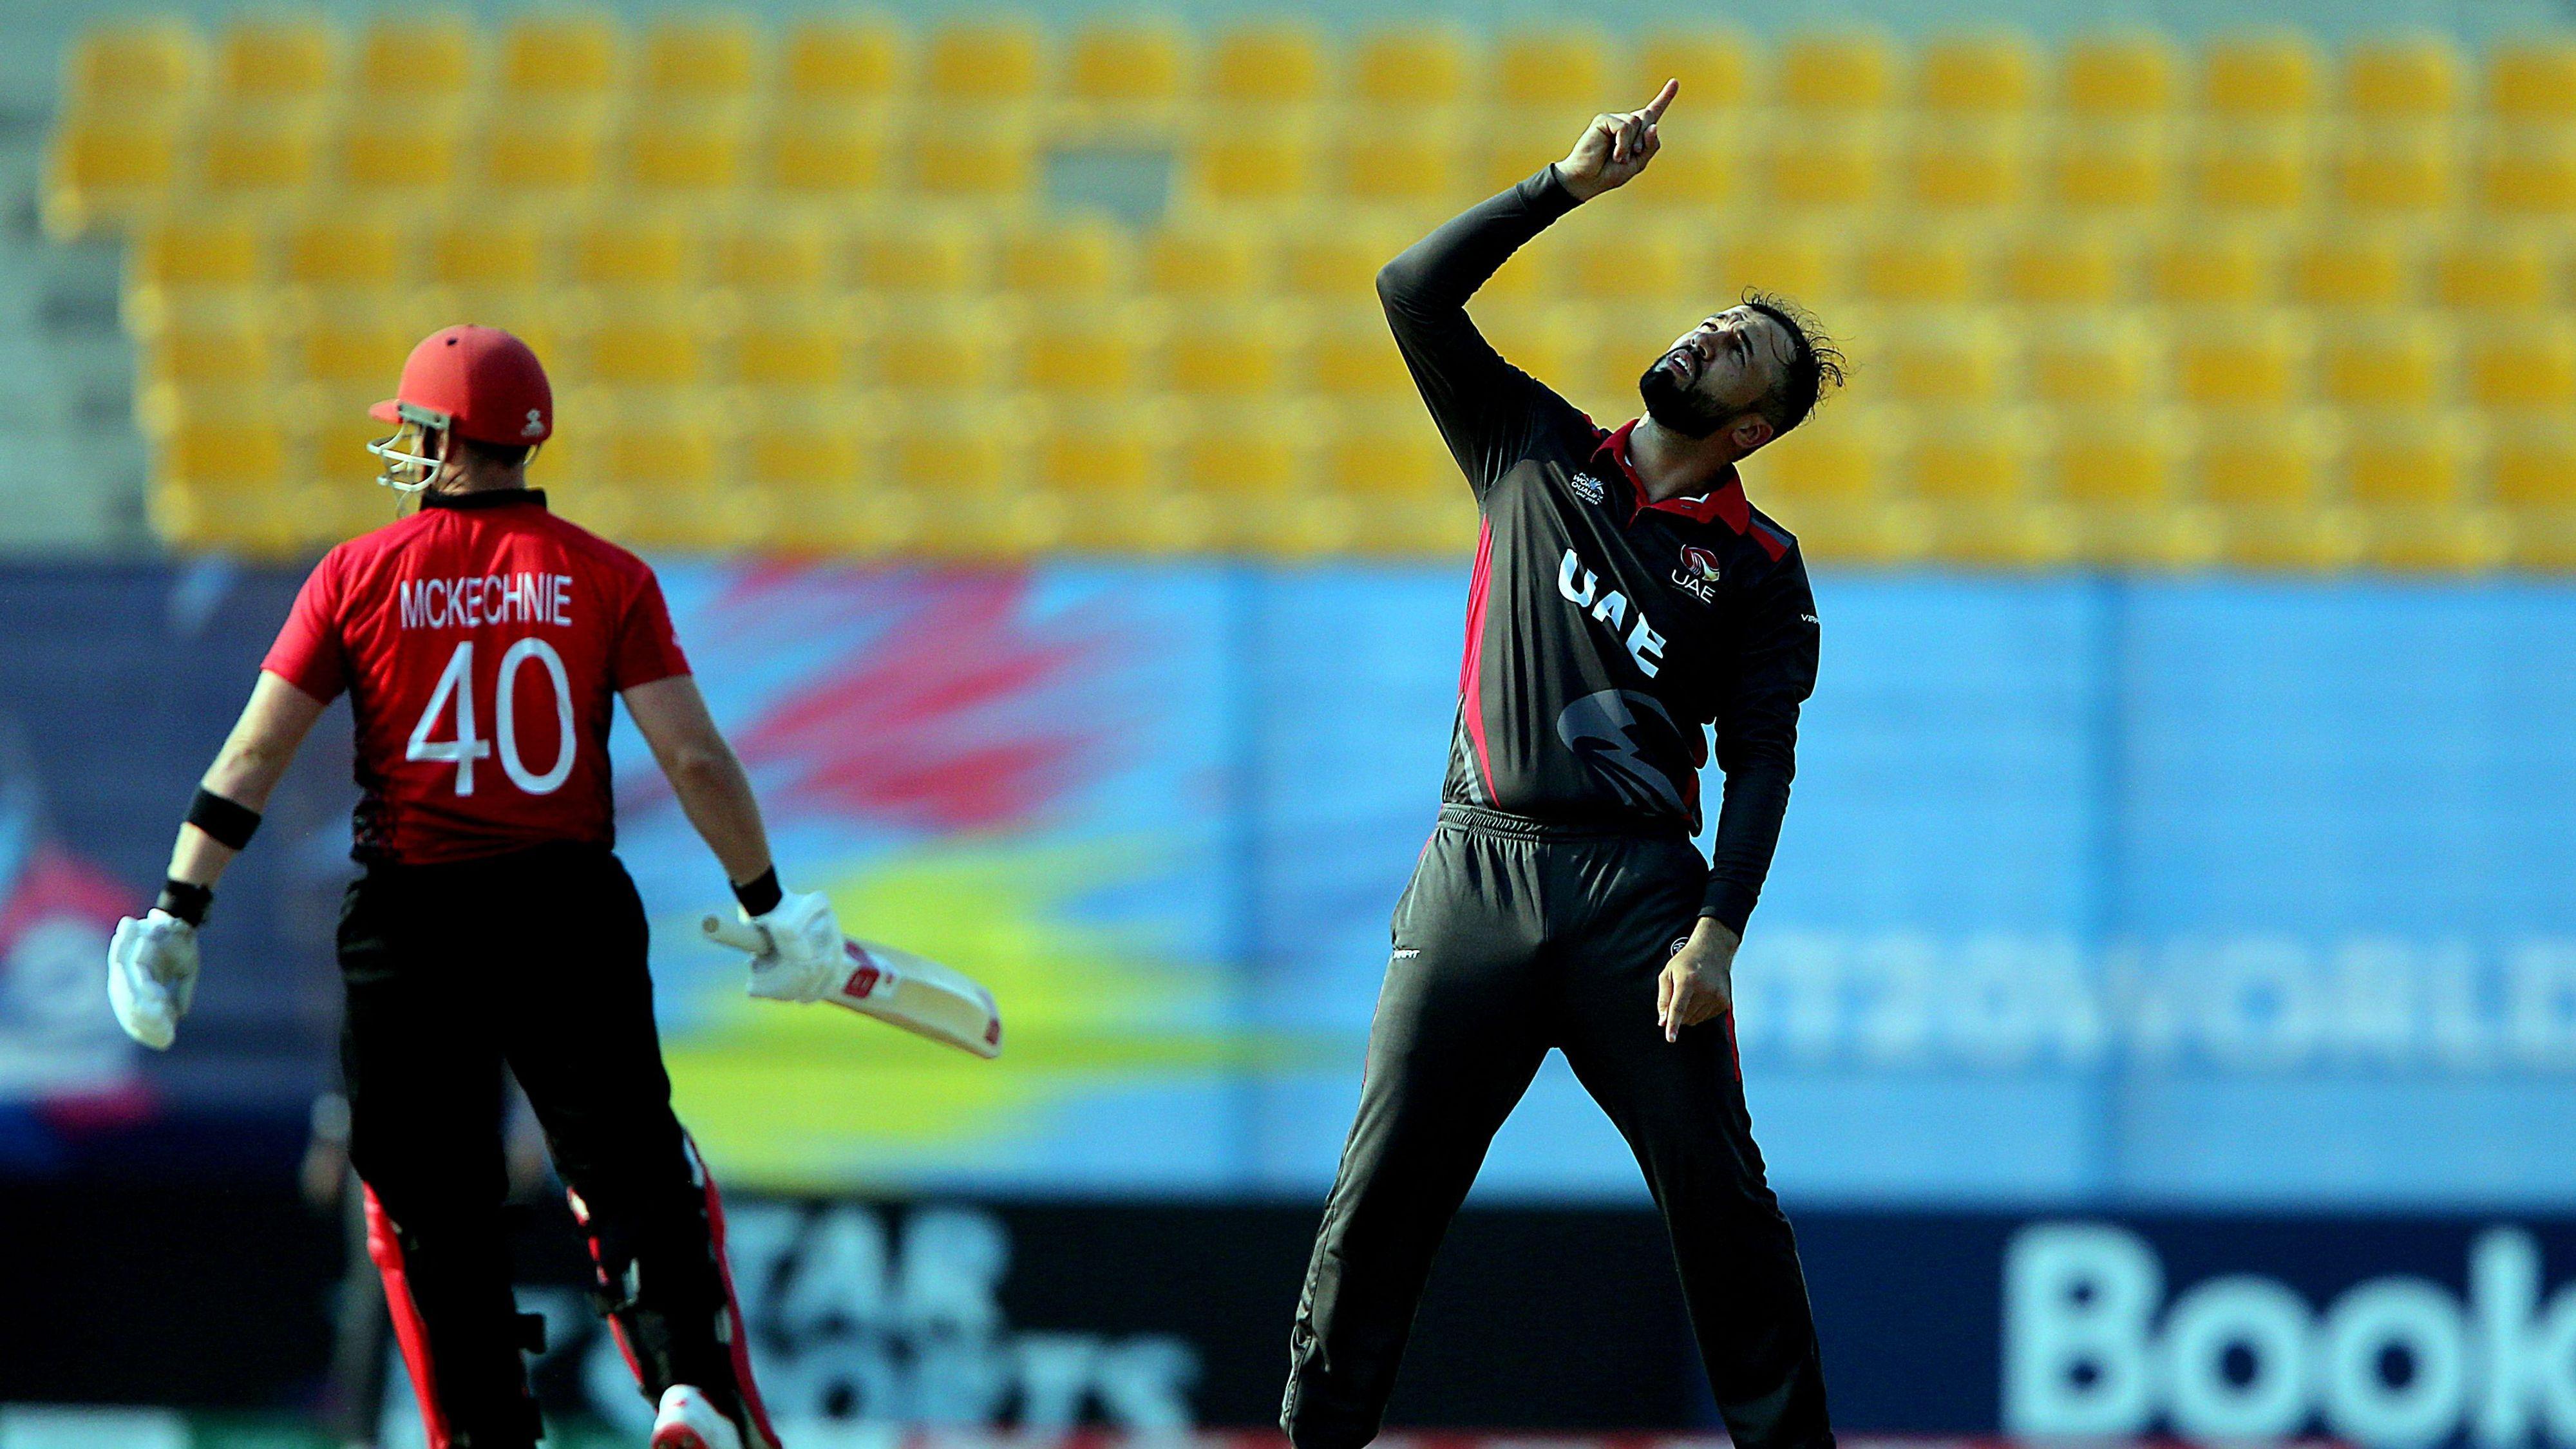 2020 T20 World Cup Qualifier Rohan Mustafa Stars Again As Uae Thump Hong Kong To Jump Into Top Spot World Cup Qualifiers World Cup Cricket Score